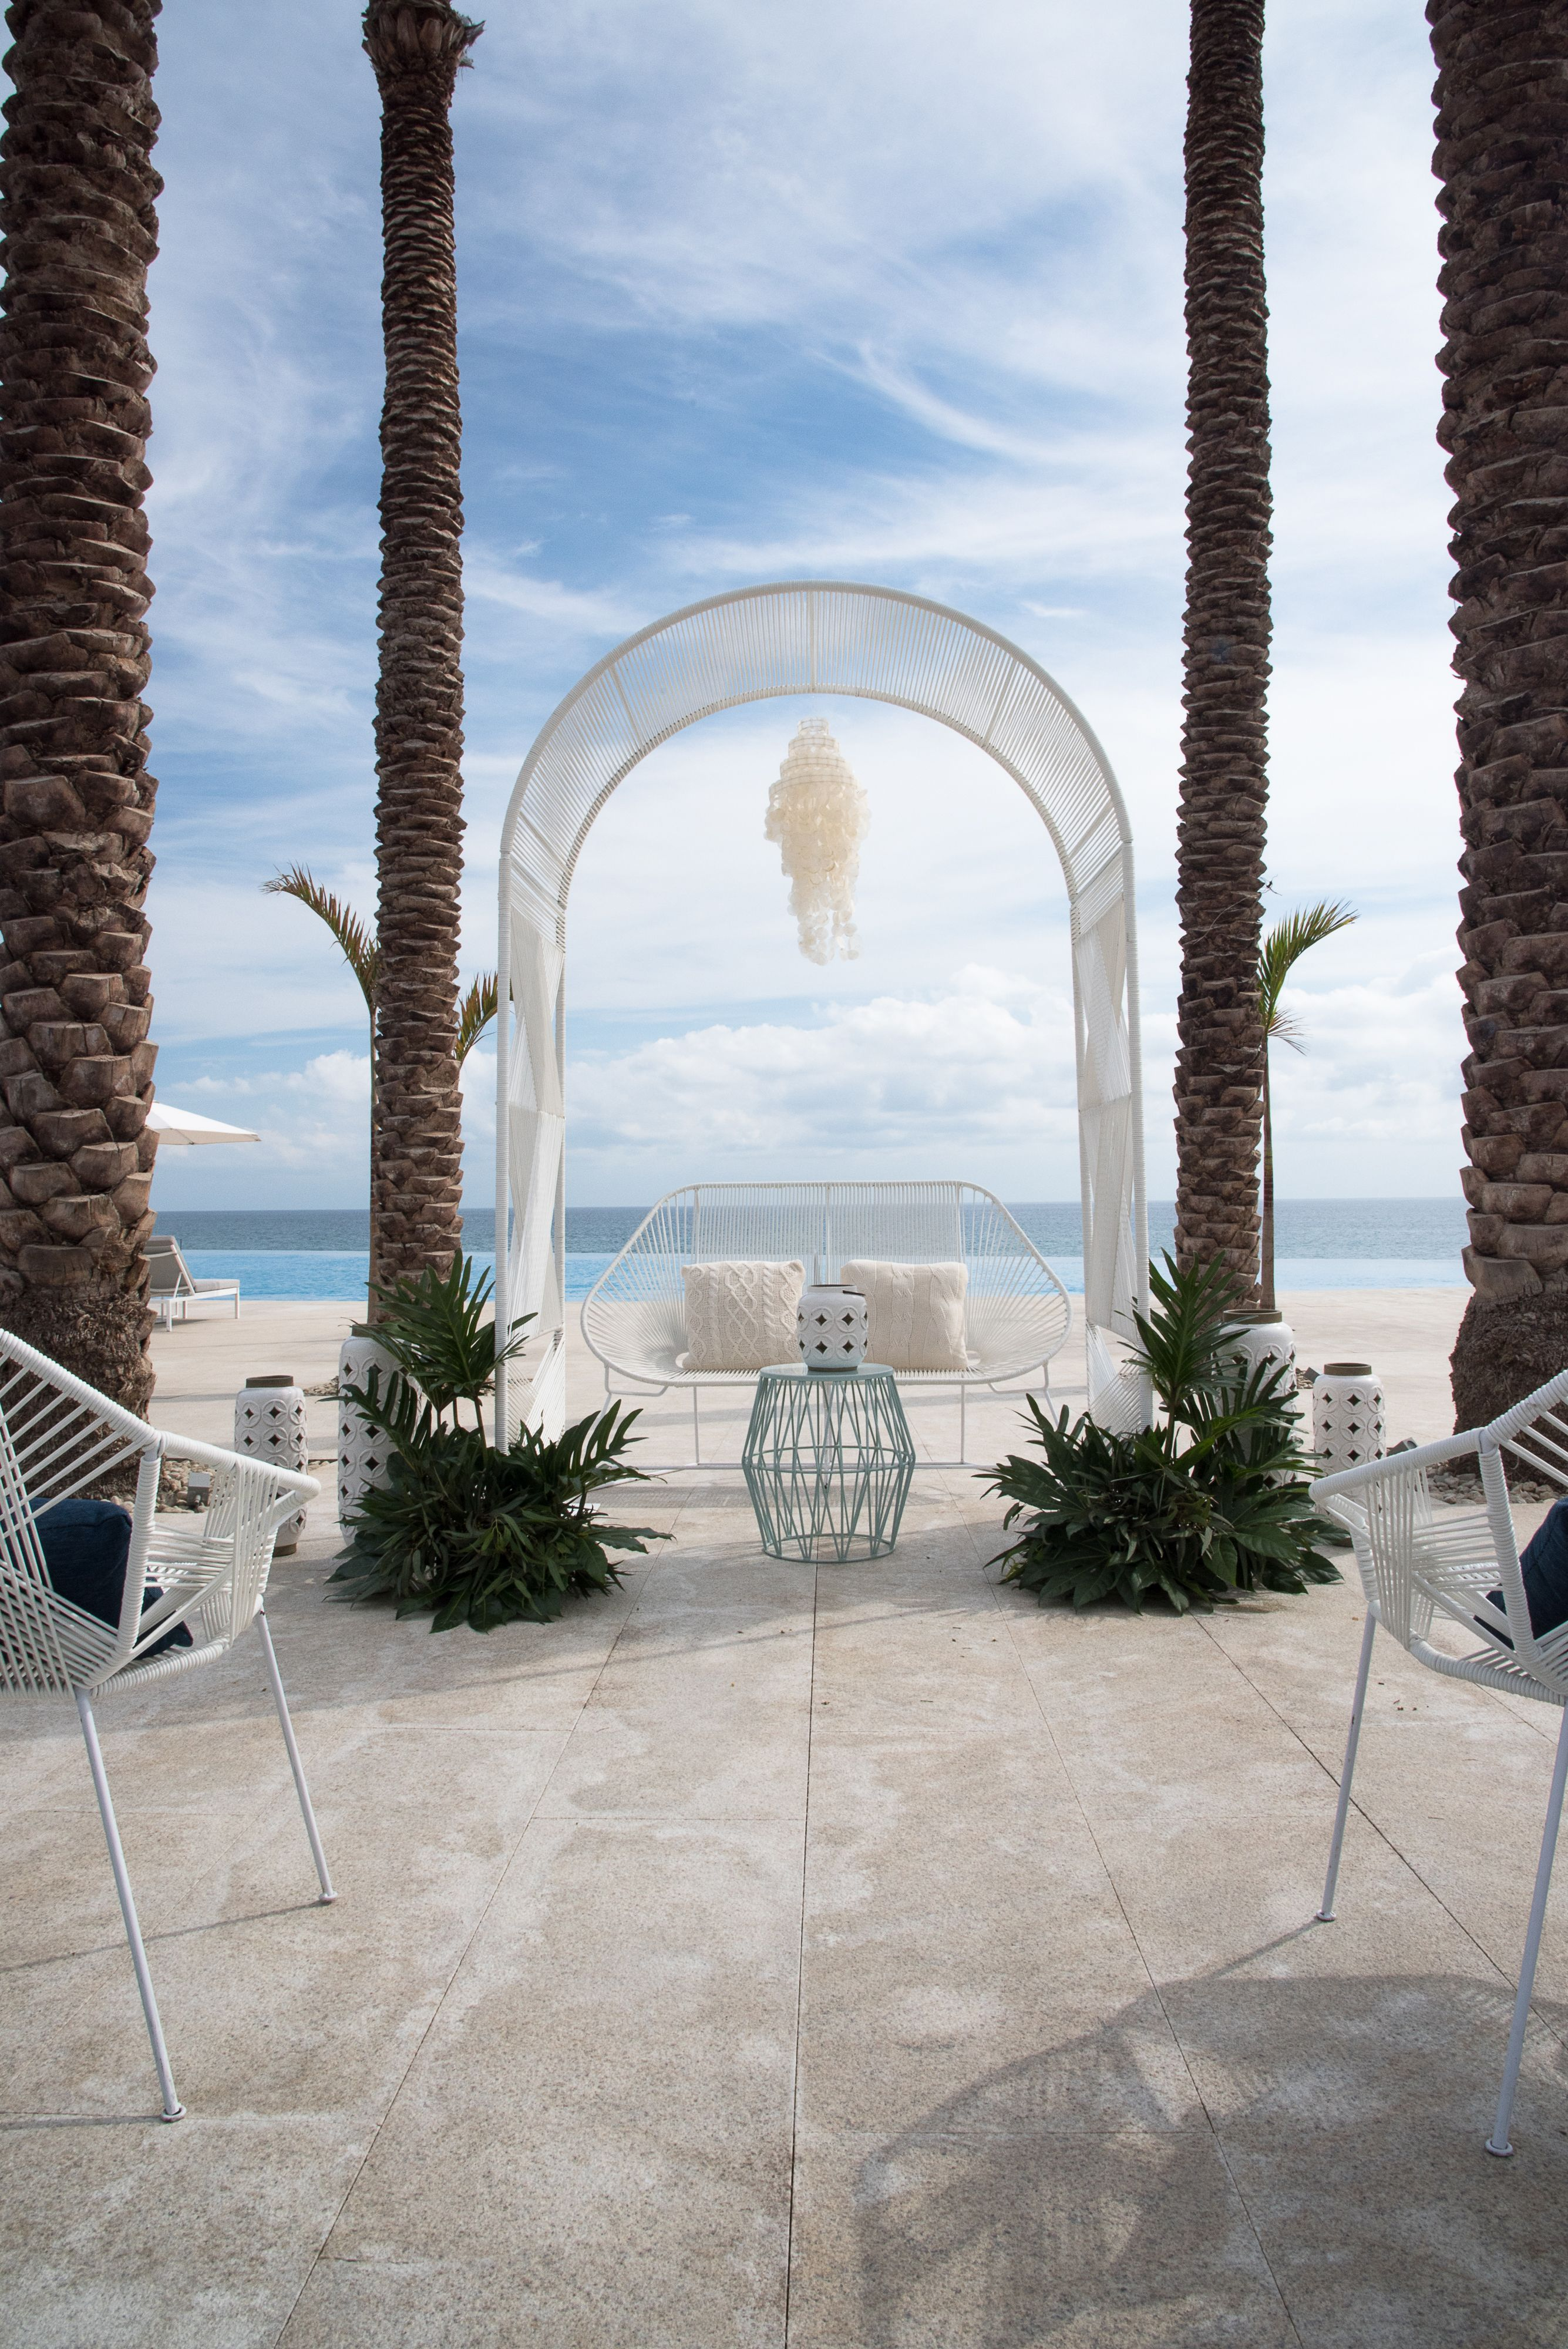 Dream Destination Weddings at Palace Resorts Dream